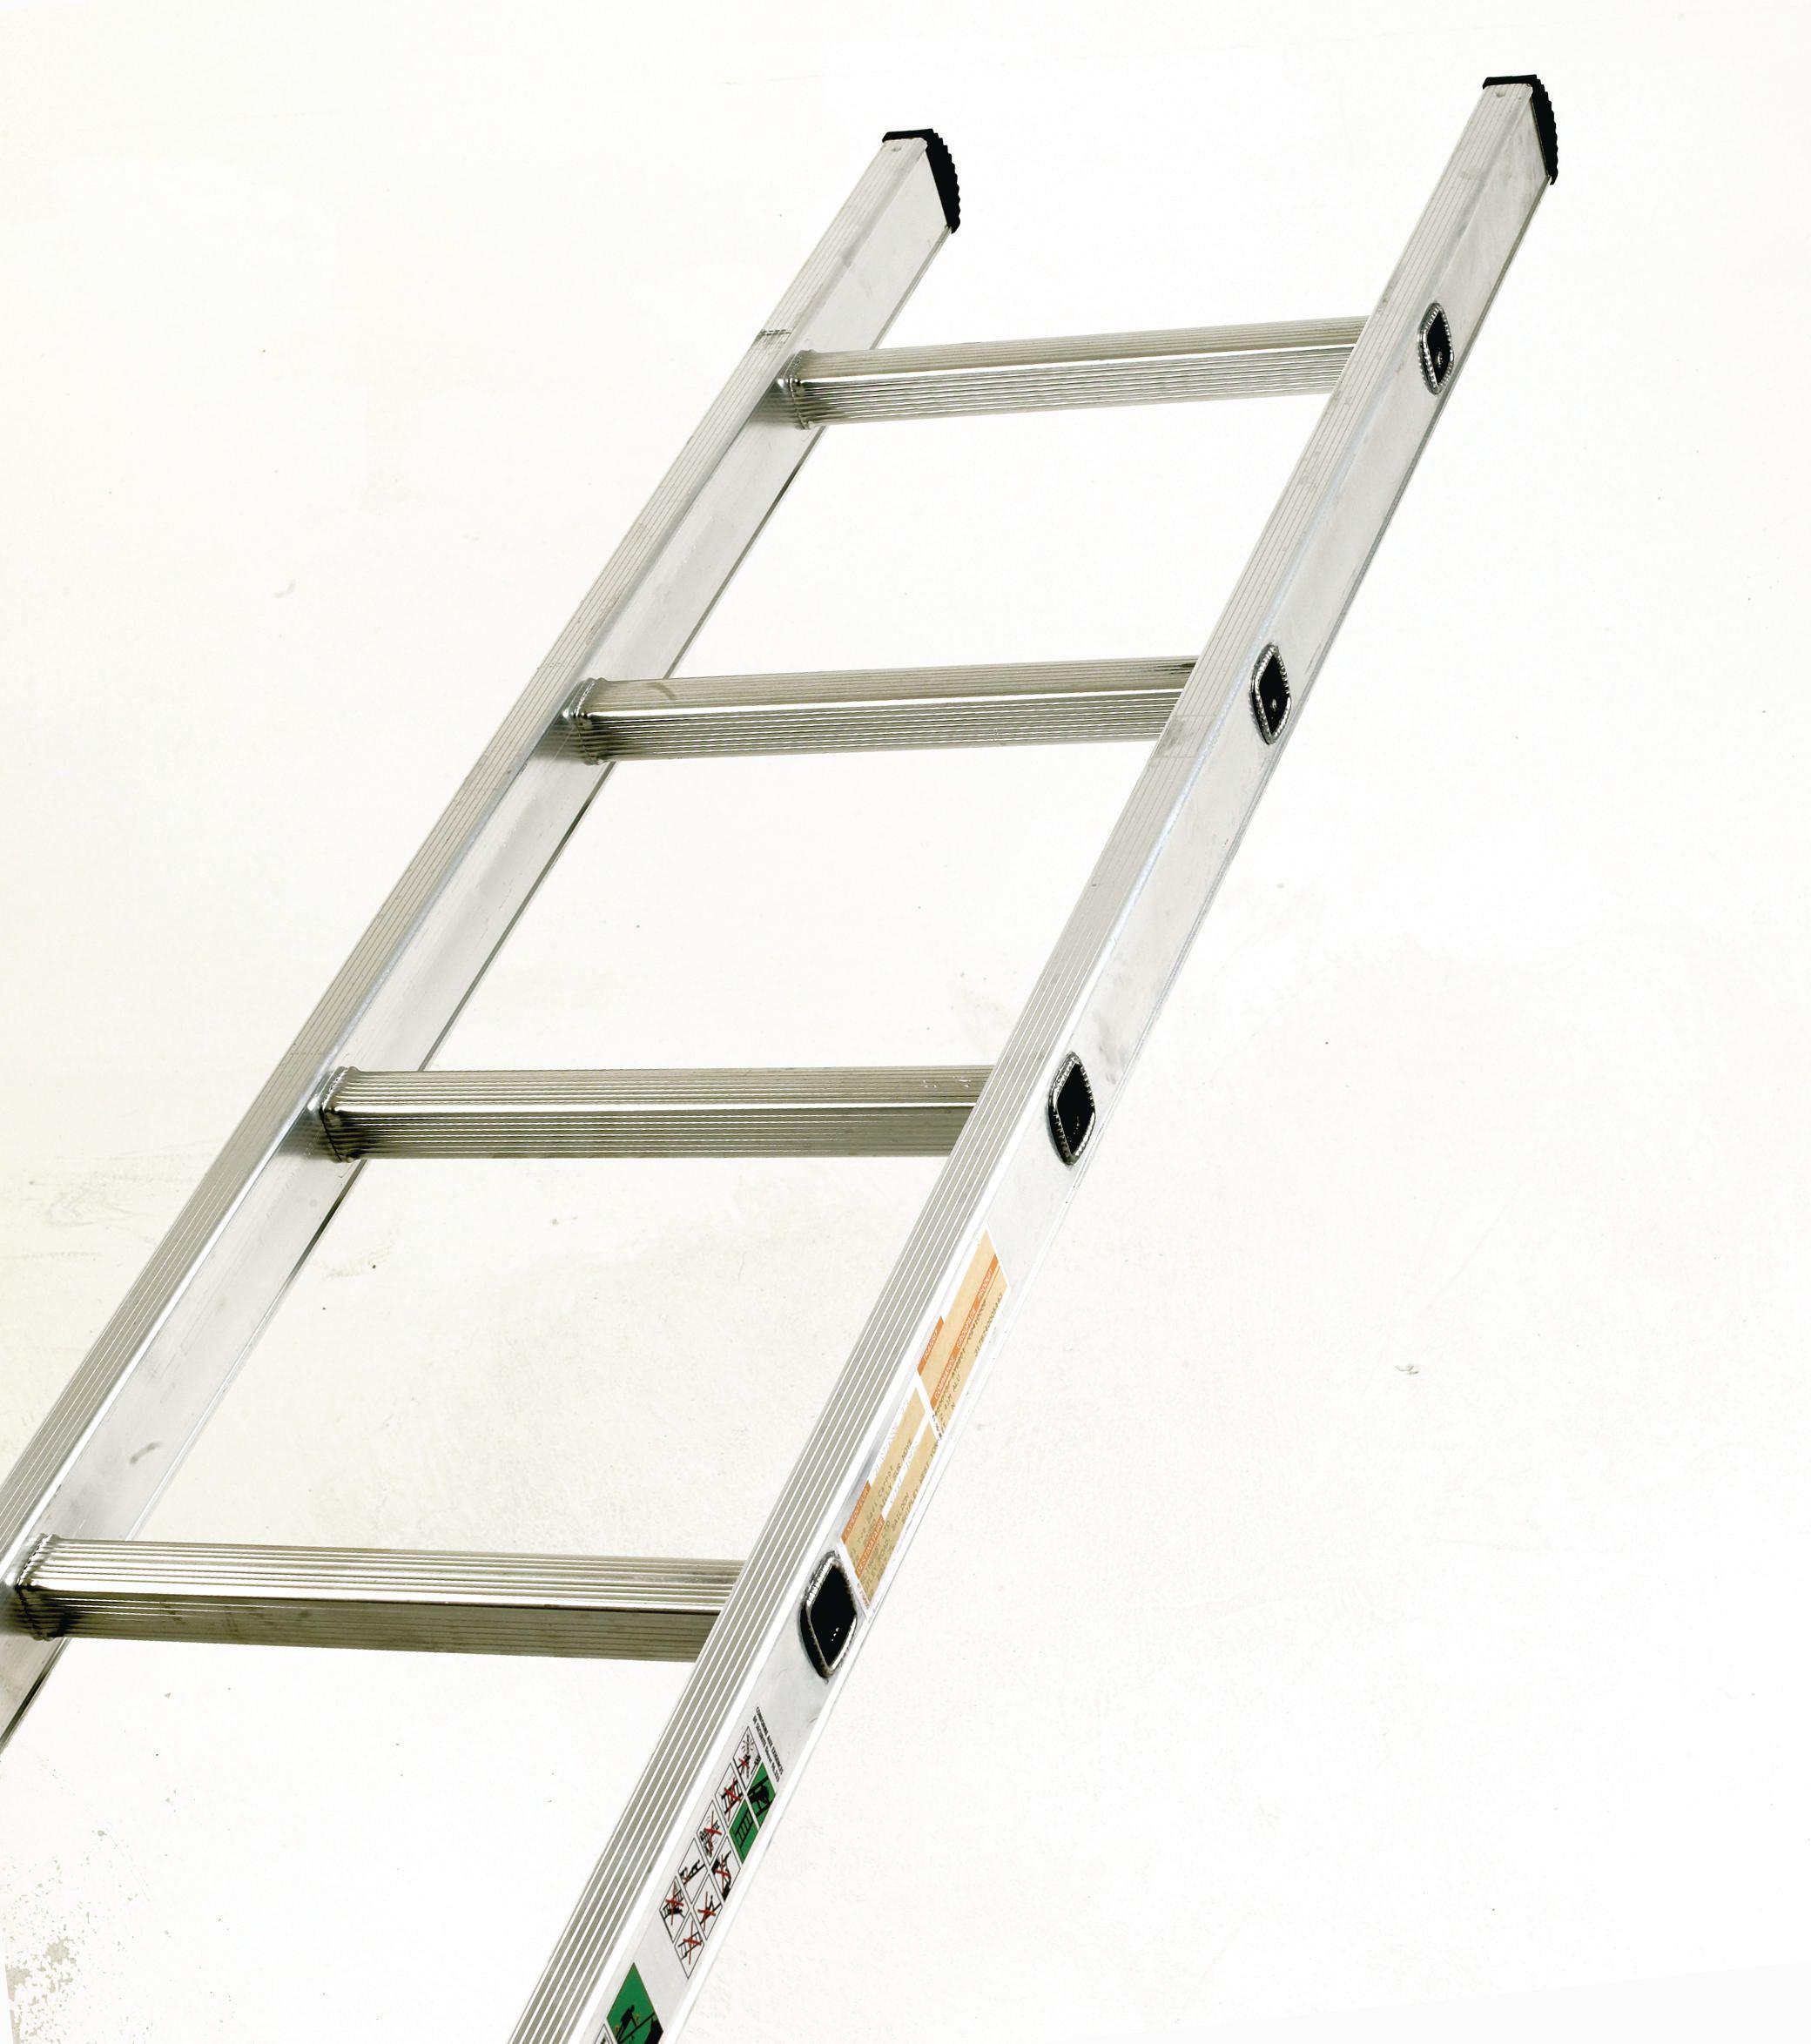 Aluminium Ladder Single Section 10 Rungs